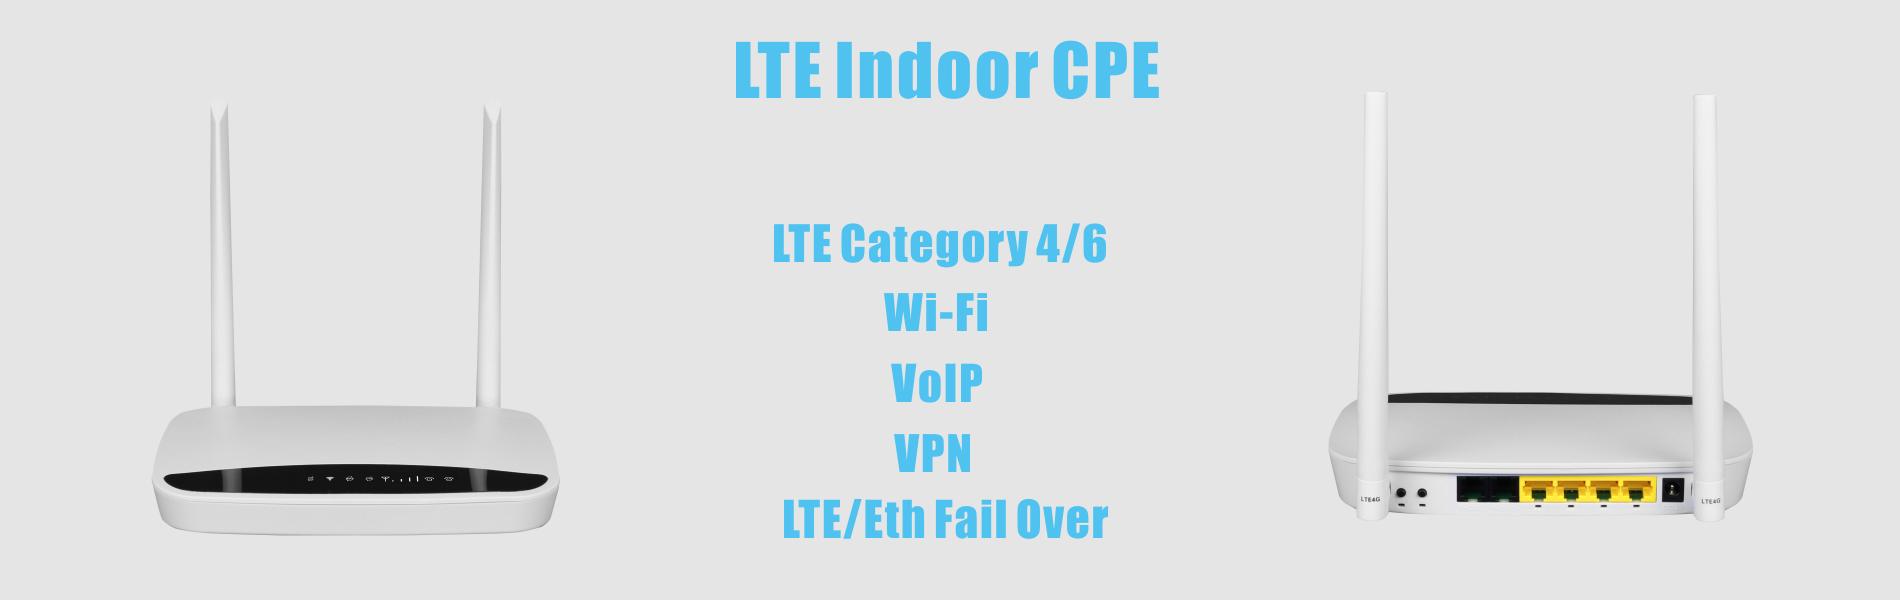 LTE Indoor CPE